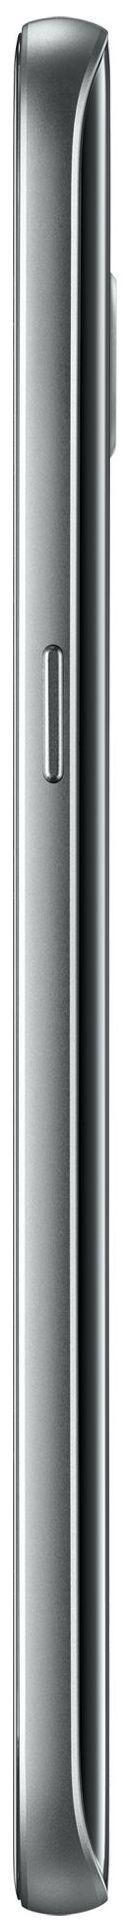 Мобильный телефон Samsung Galaxy S7 Duos G930 (SM-G930FZKUSEK) Black - 4